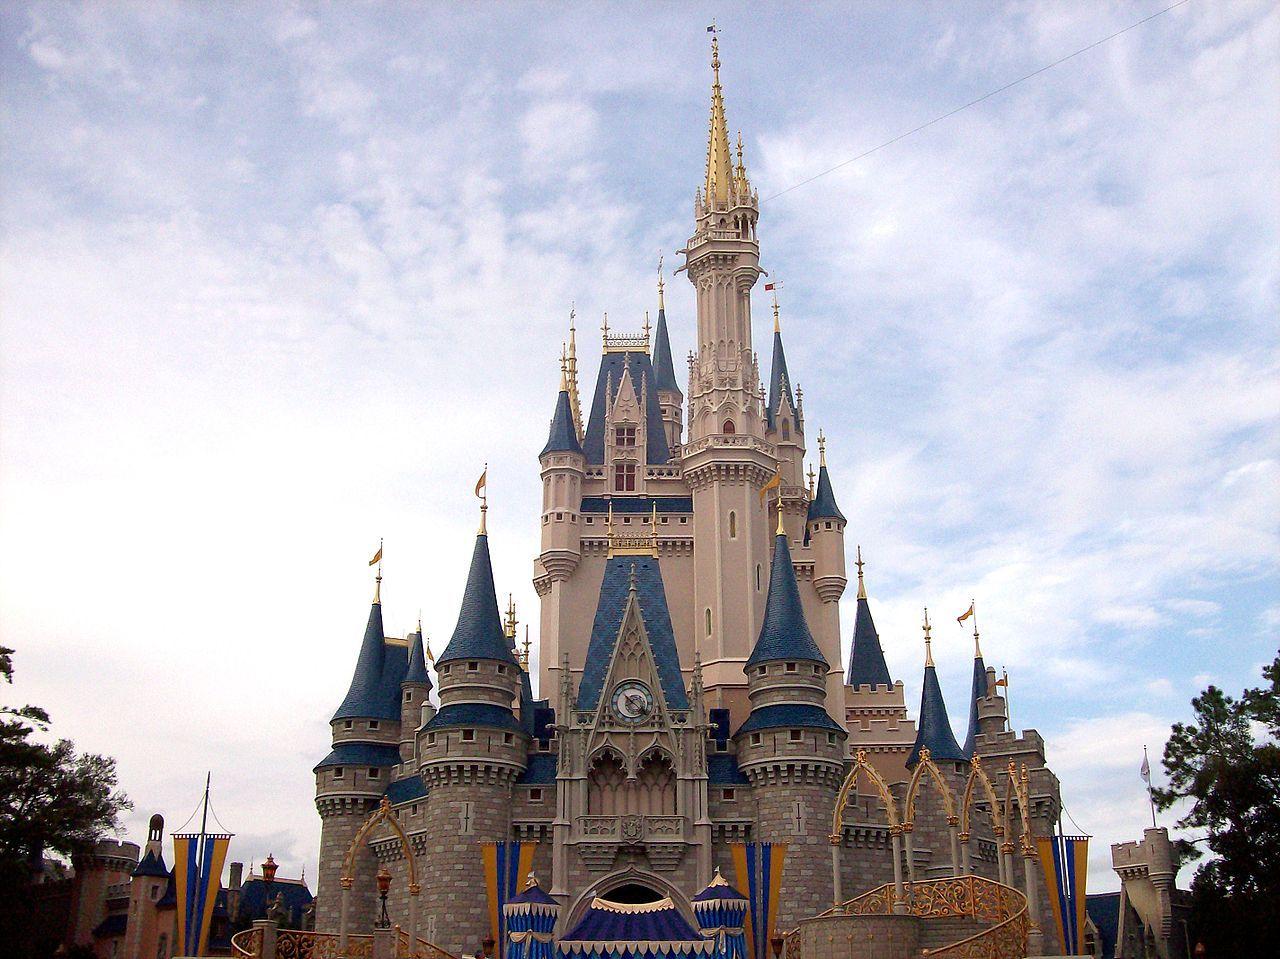 Twilights Magic Kingdom CartsBeforeHorses